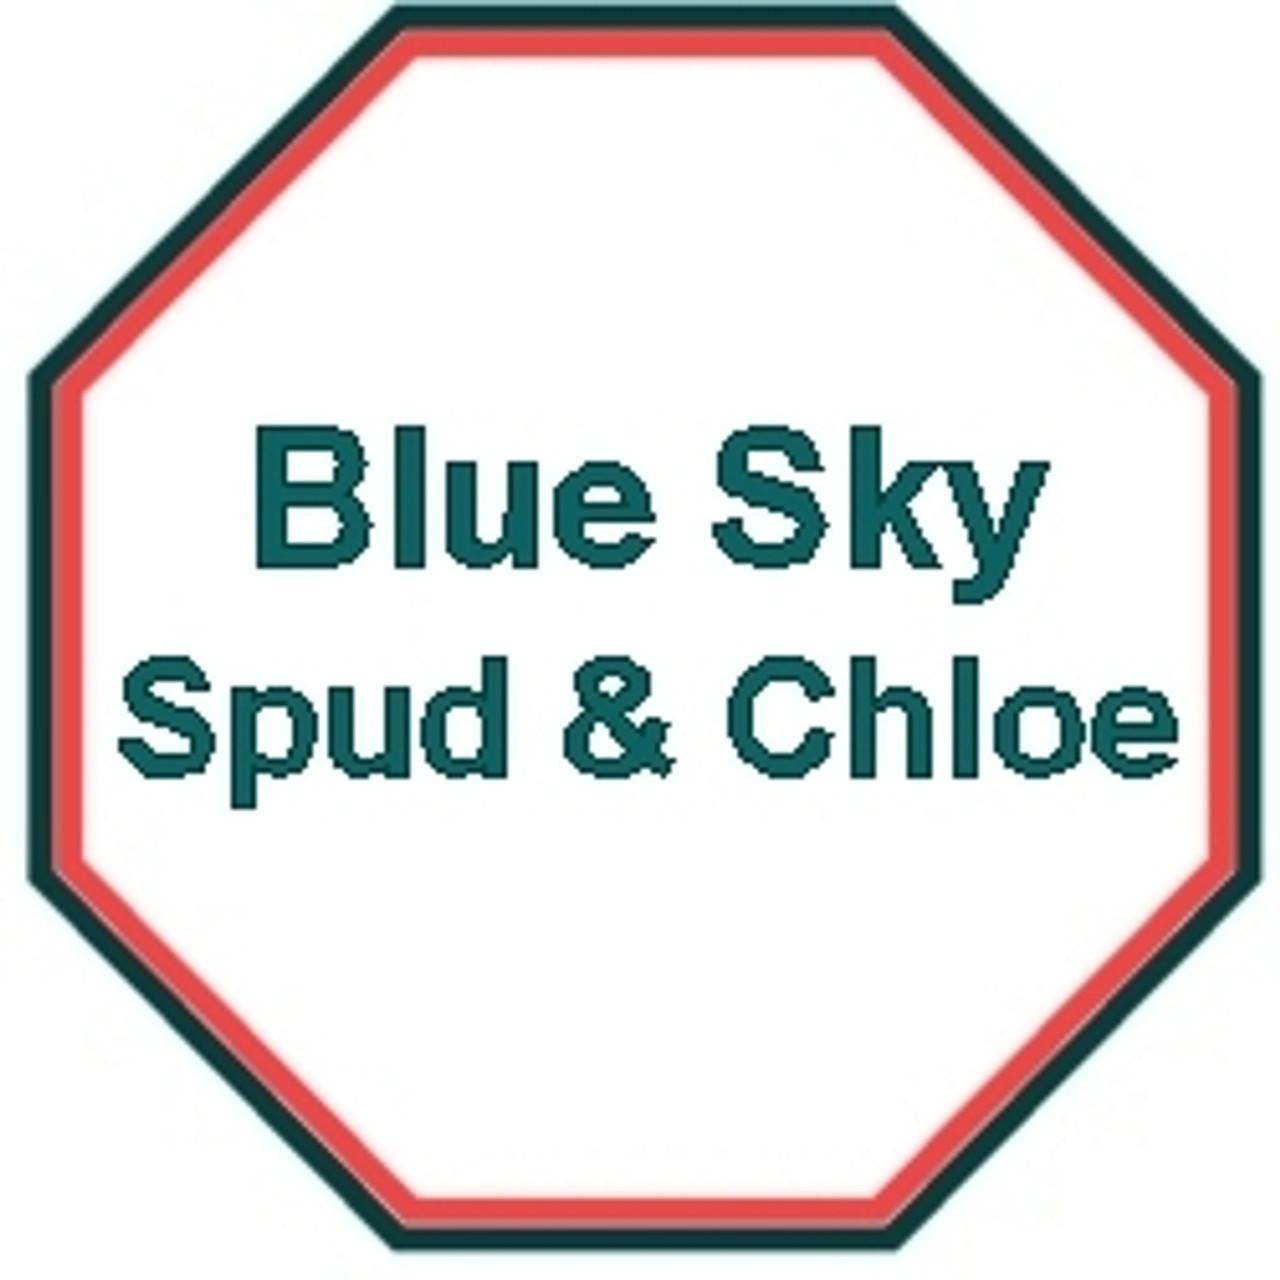 Blue Sky Fibers/Spud & Chloe